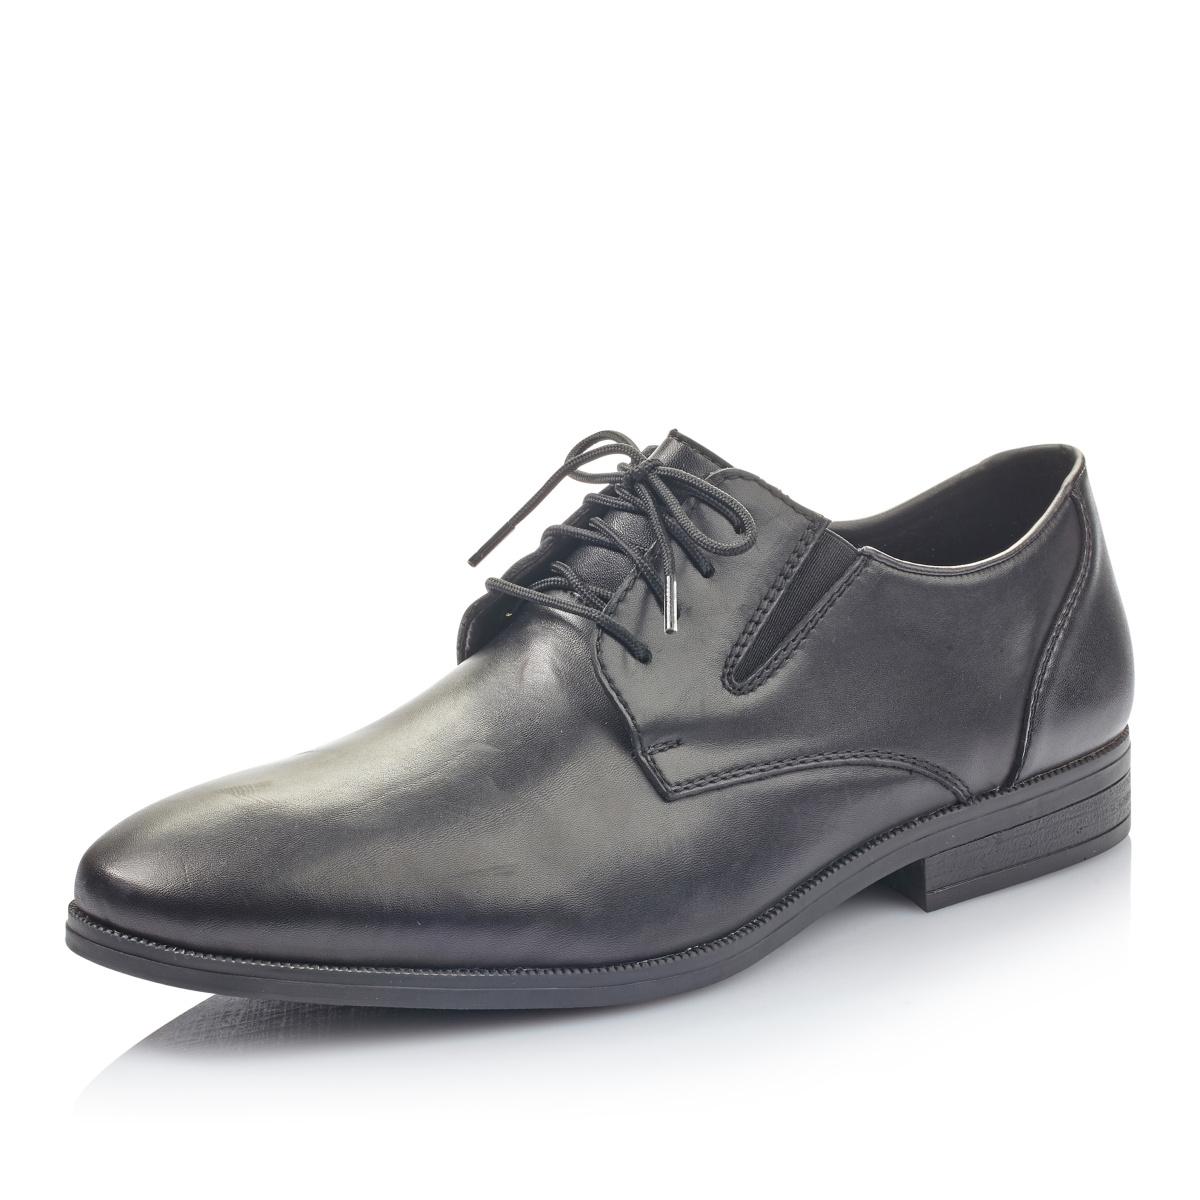 0d5097e671990 Pánska obuv RIEKER 11614-00 SCHWARZ F/S 9 | Rieker